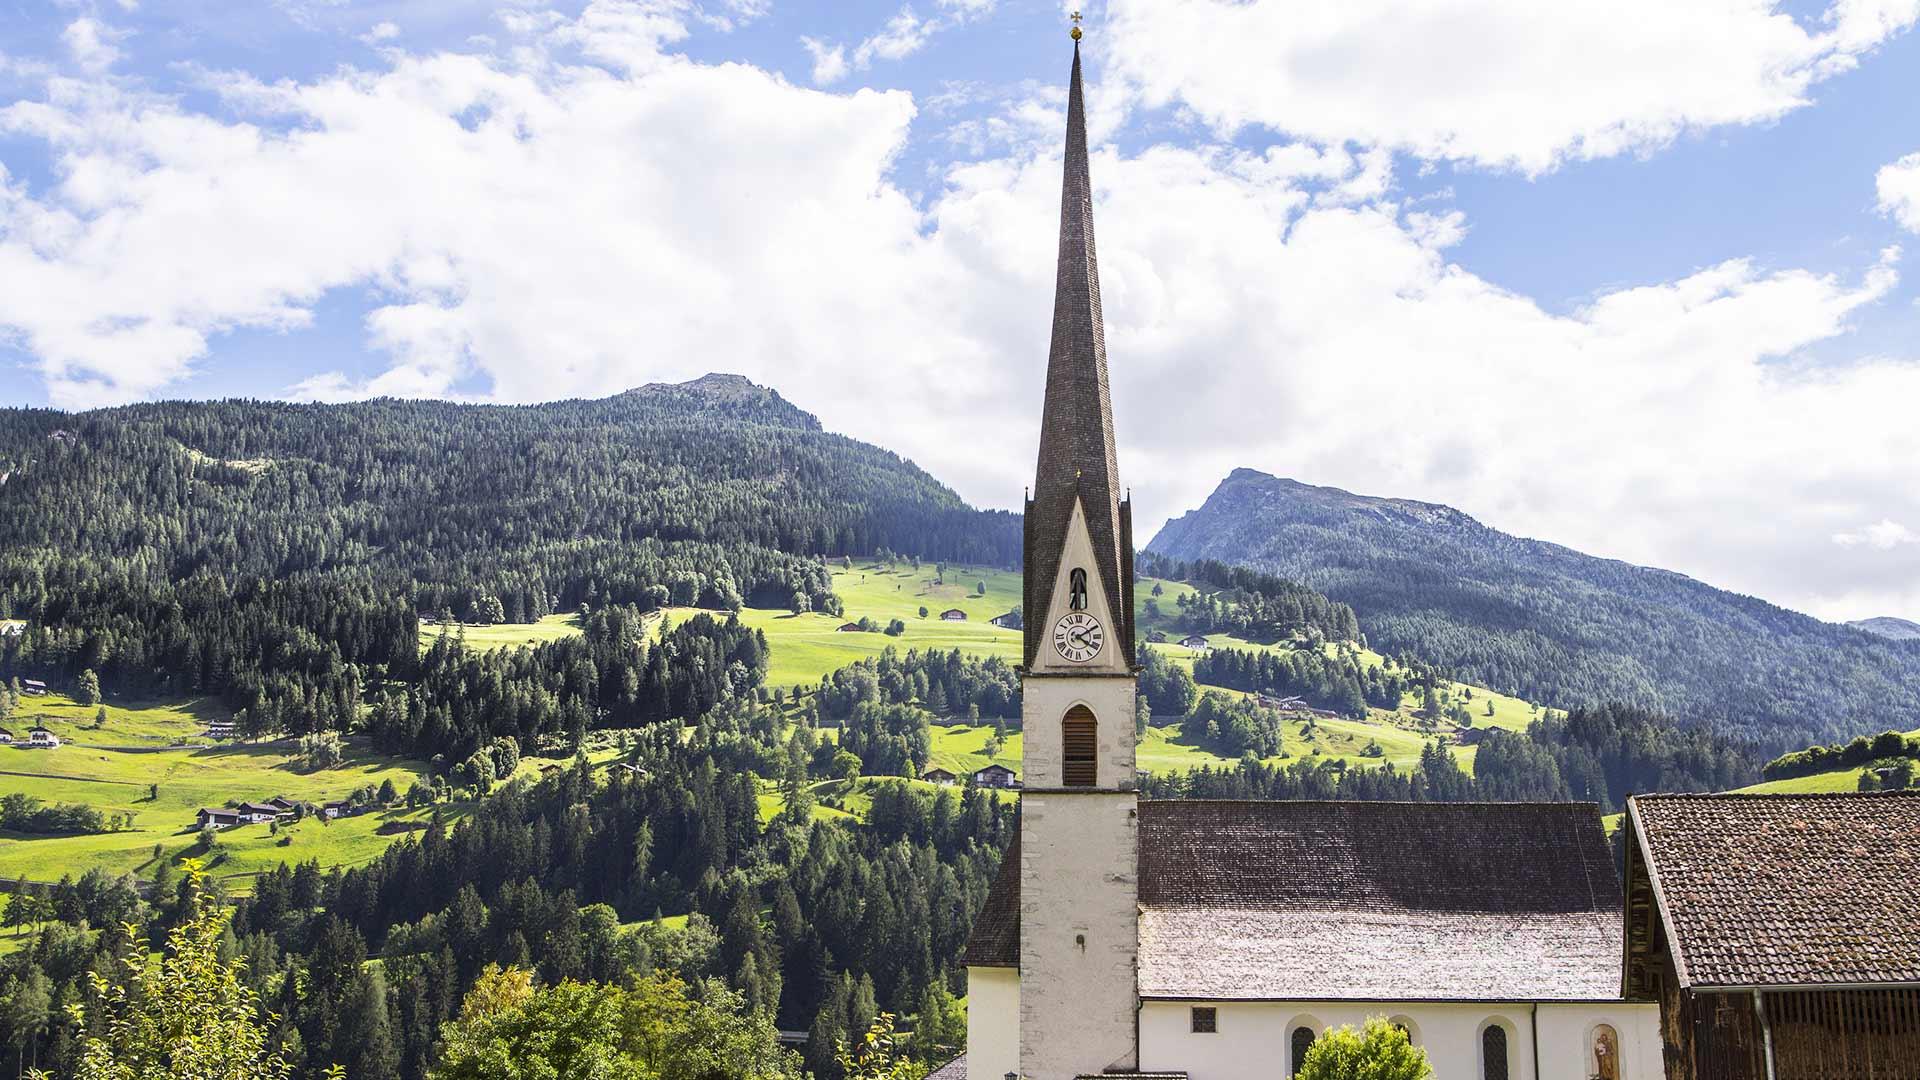 Chiesa Parrocchiale Santa Maria Assunta a Moso, Alto Adige